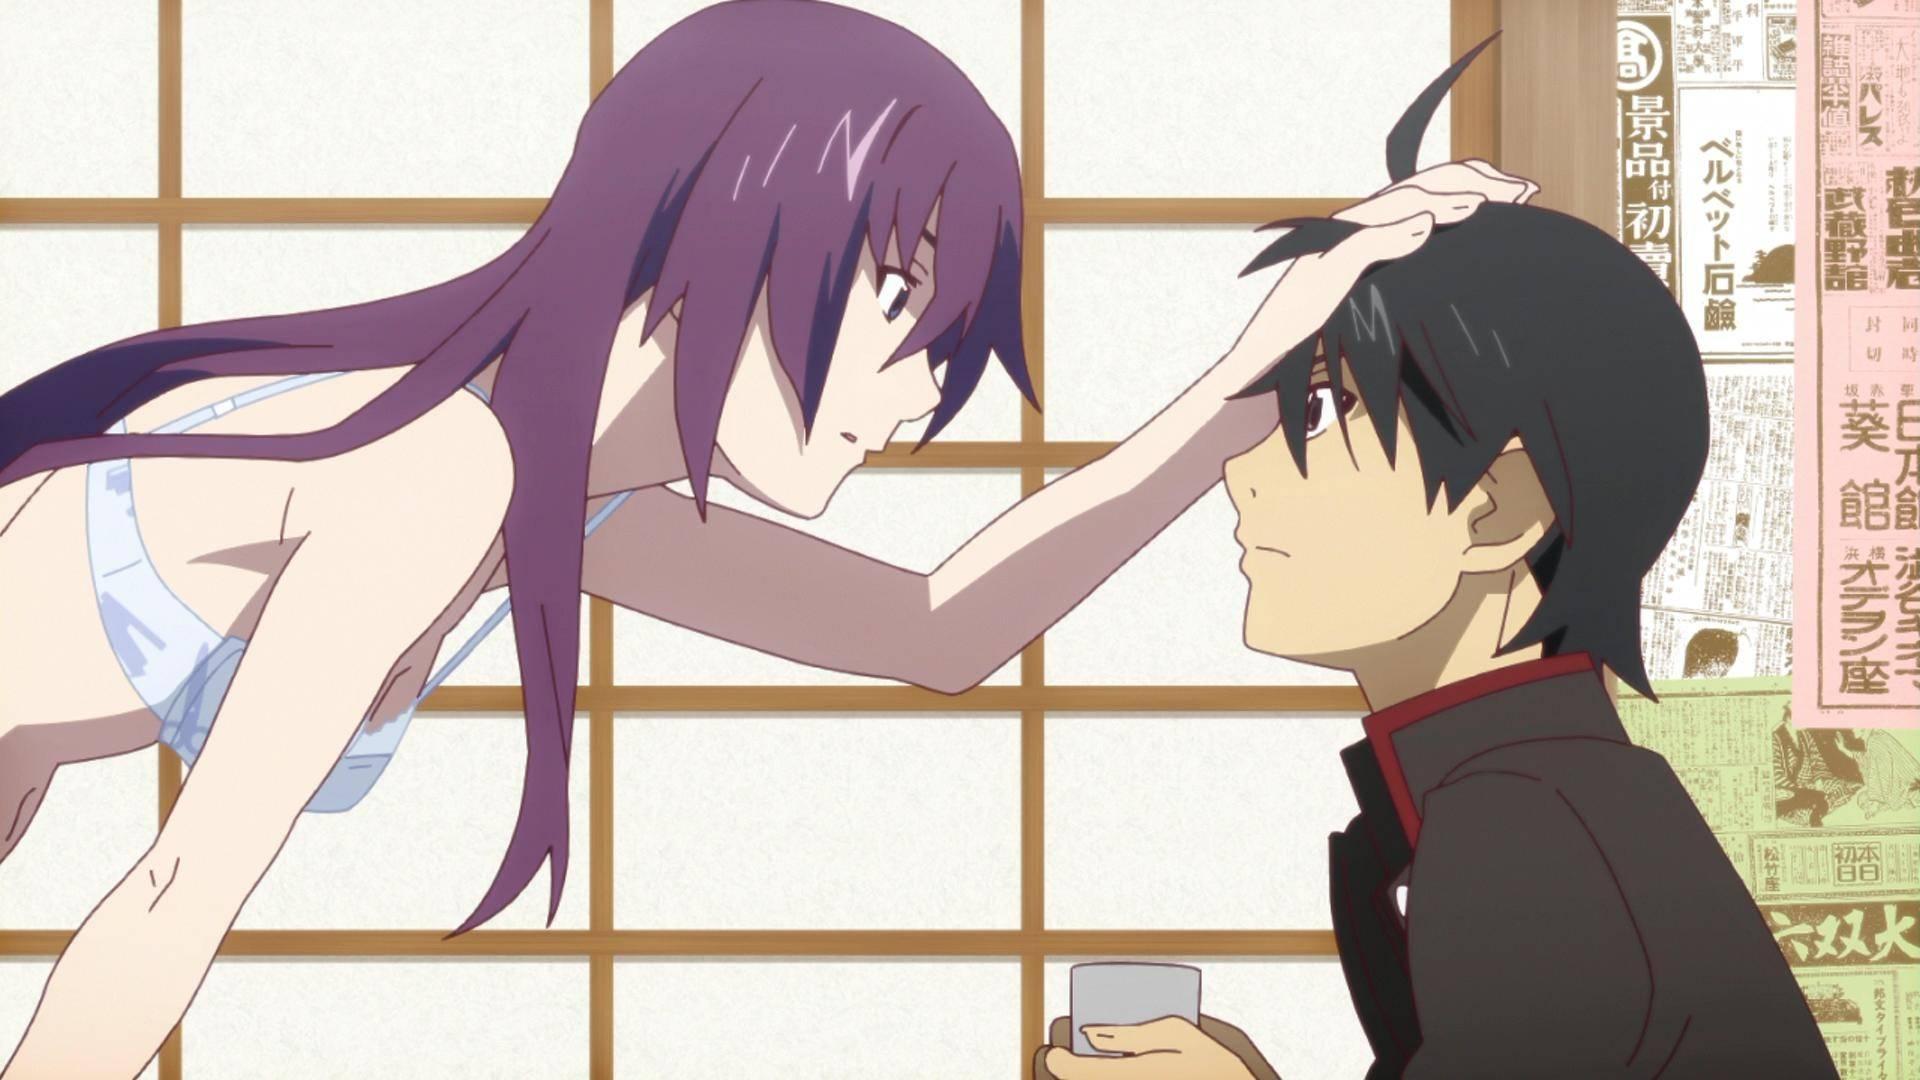 koyomi and hitagi relationship problems